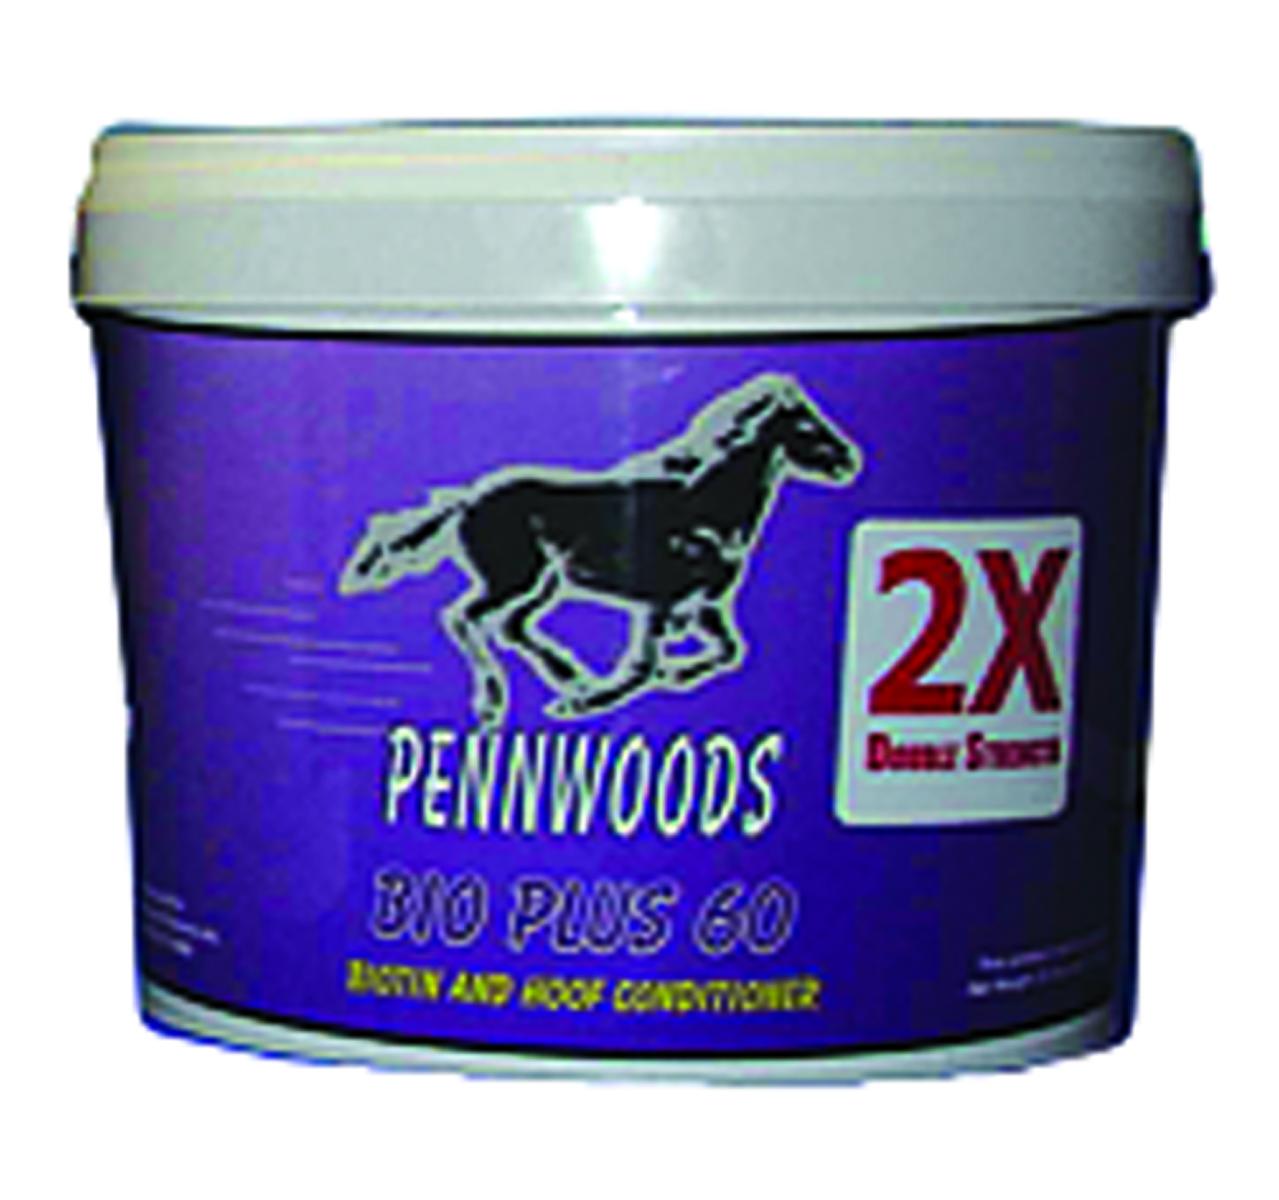 Pennwoods Bio Plus 60 2X